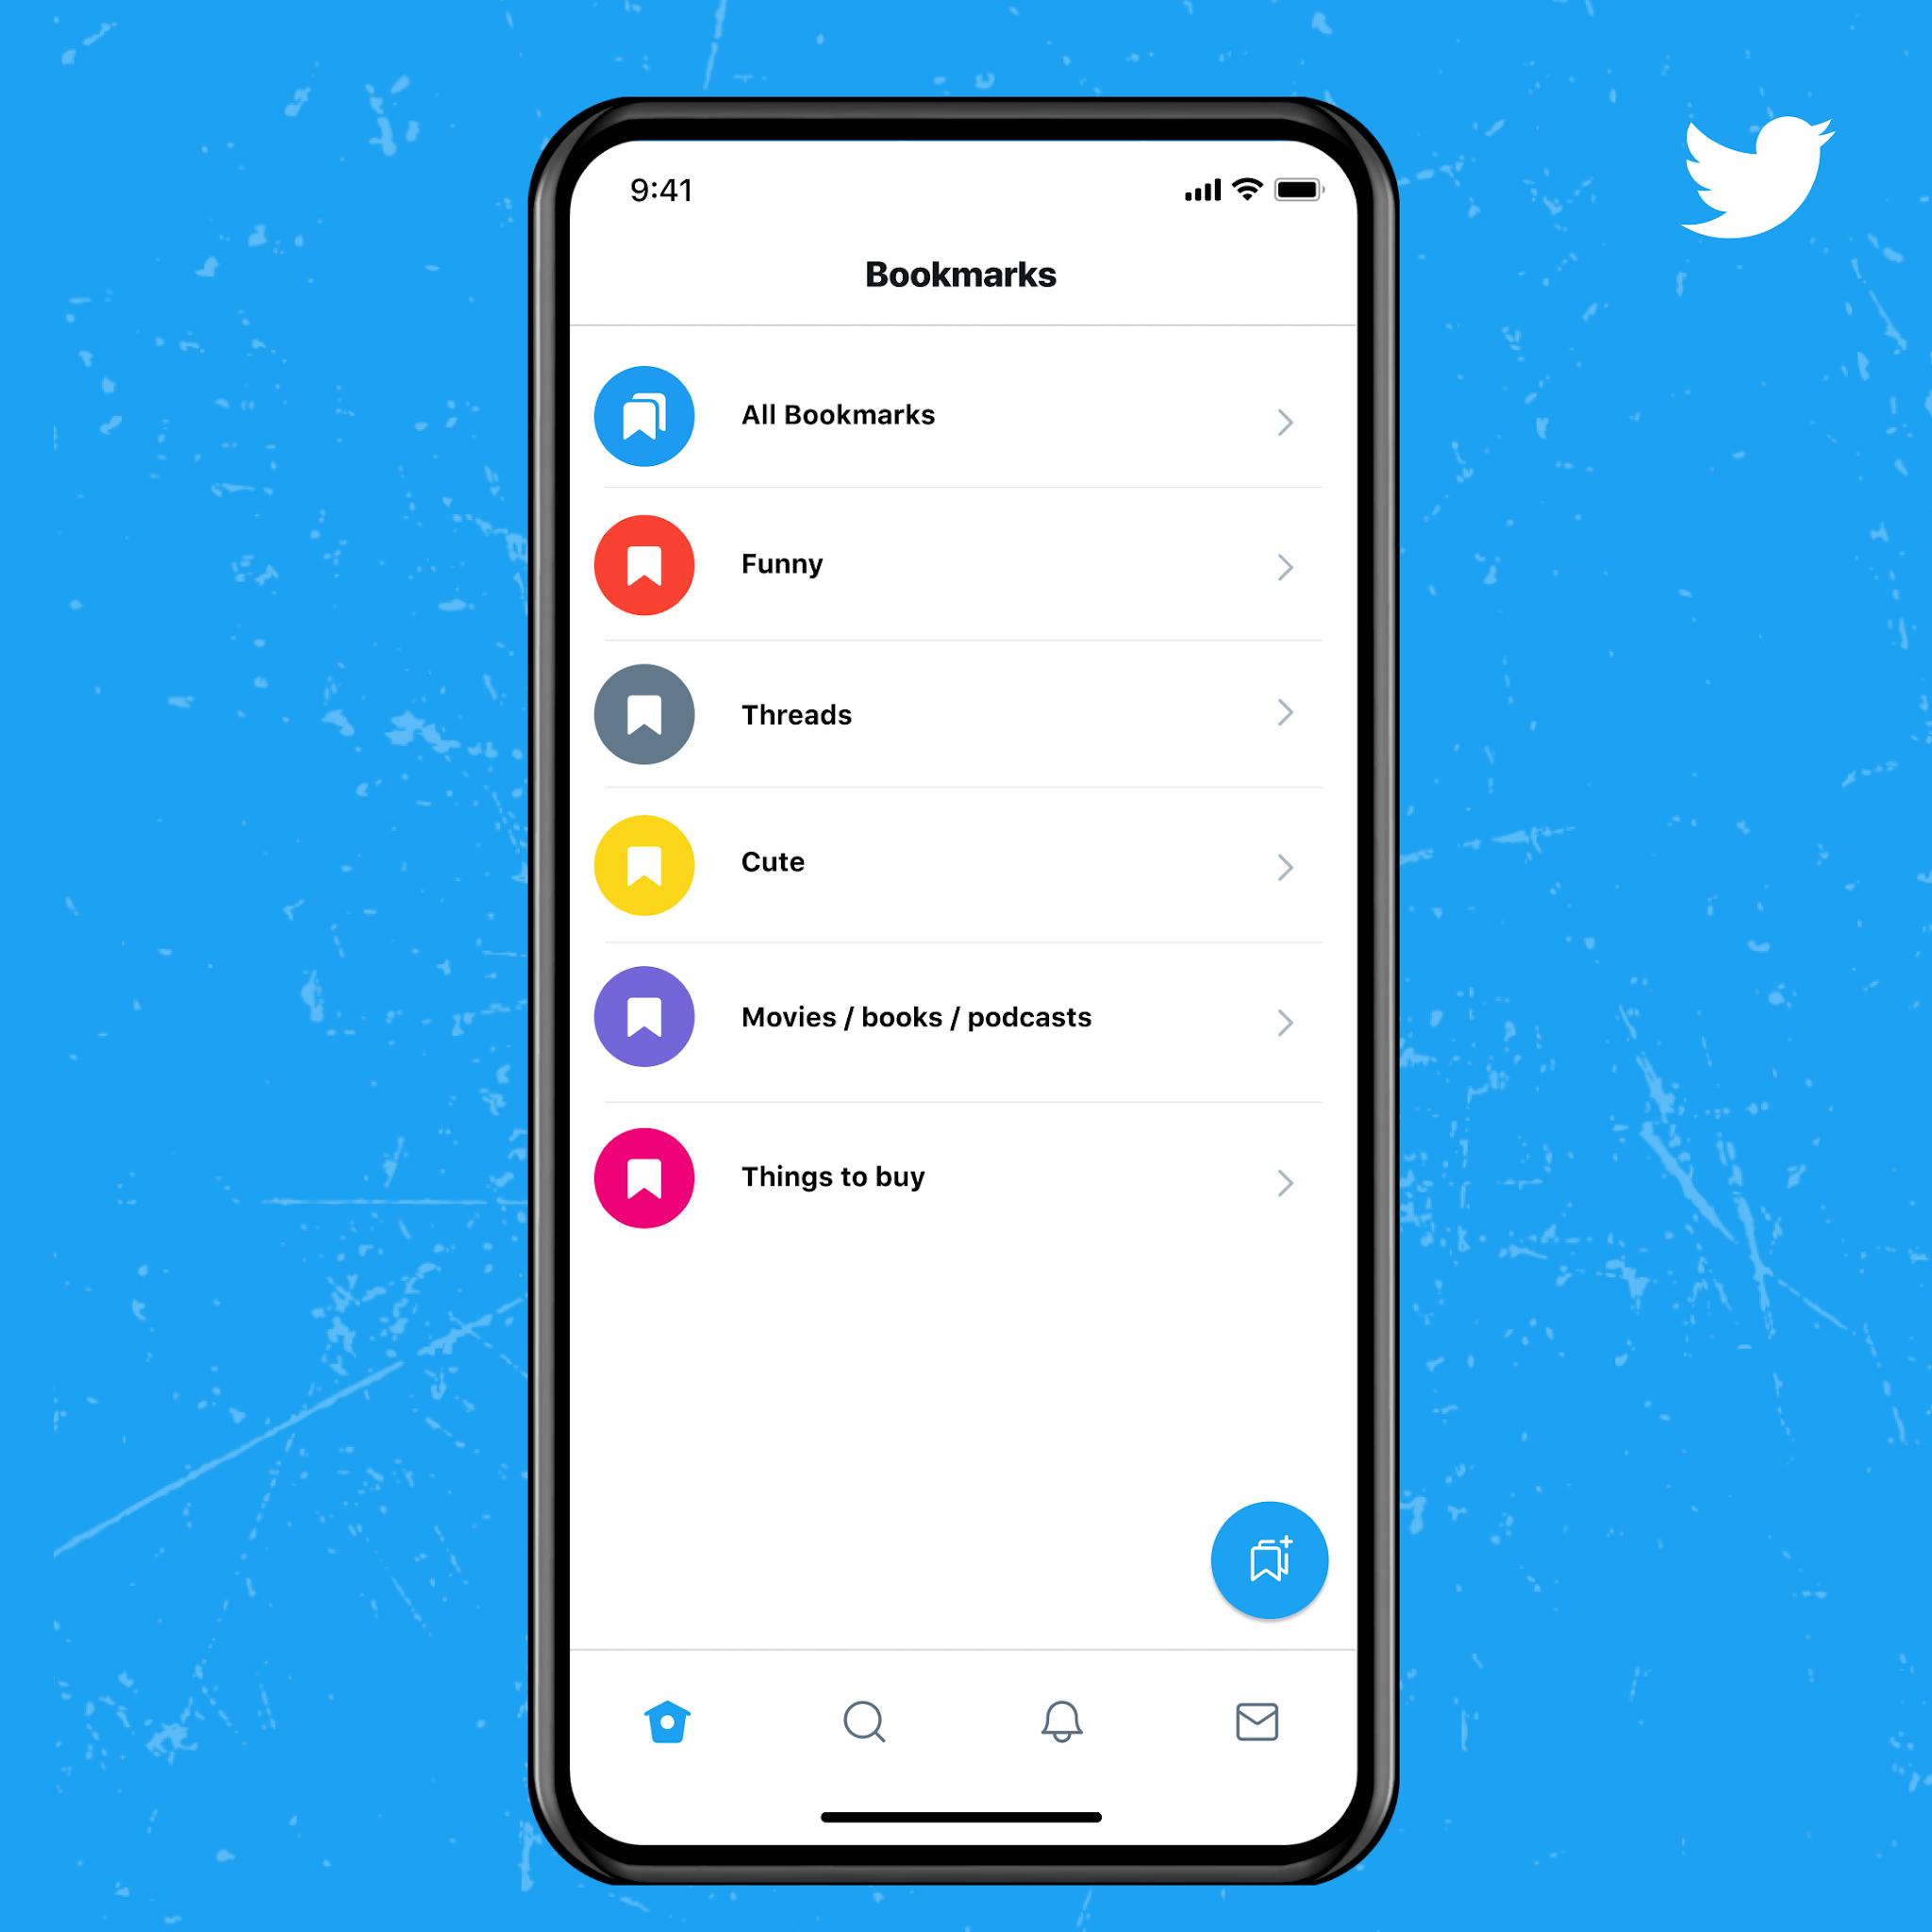 Twitter Blue Bookmarks Yer imi özelliği